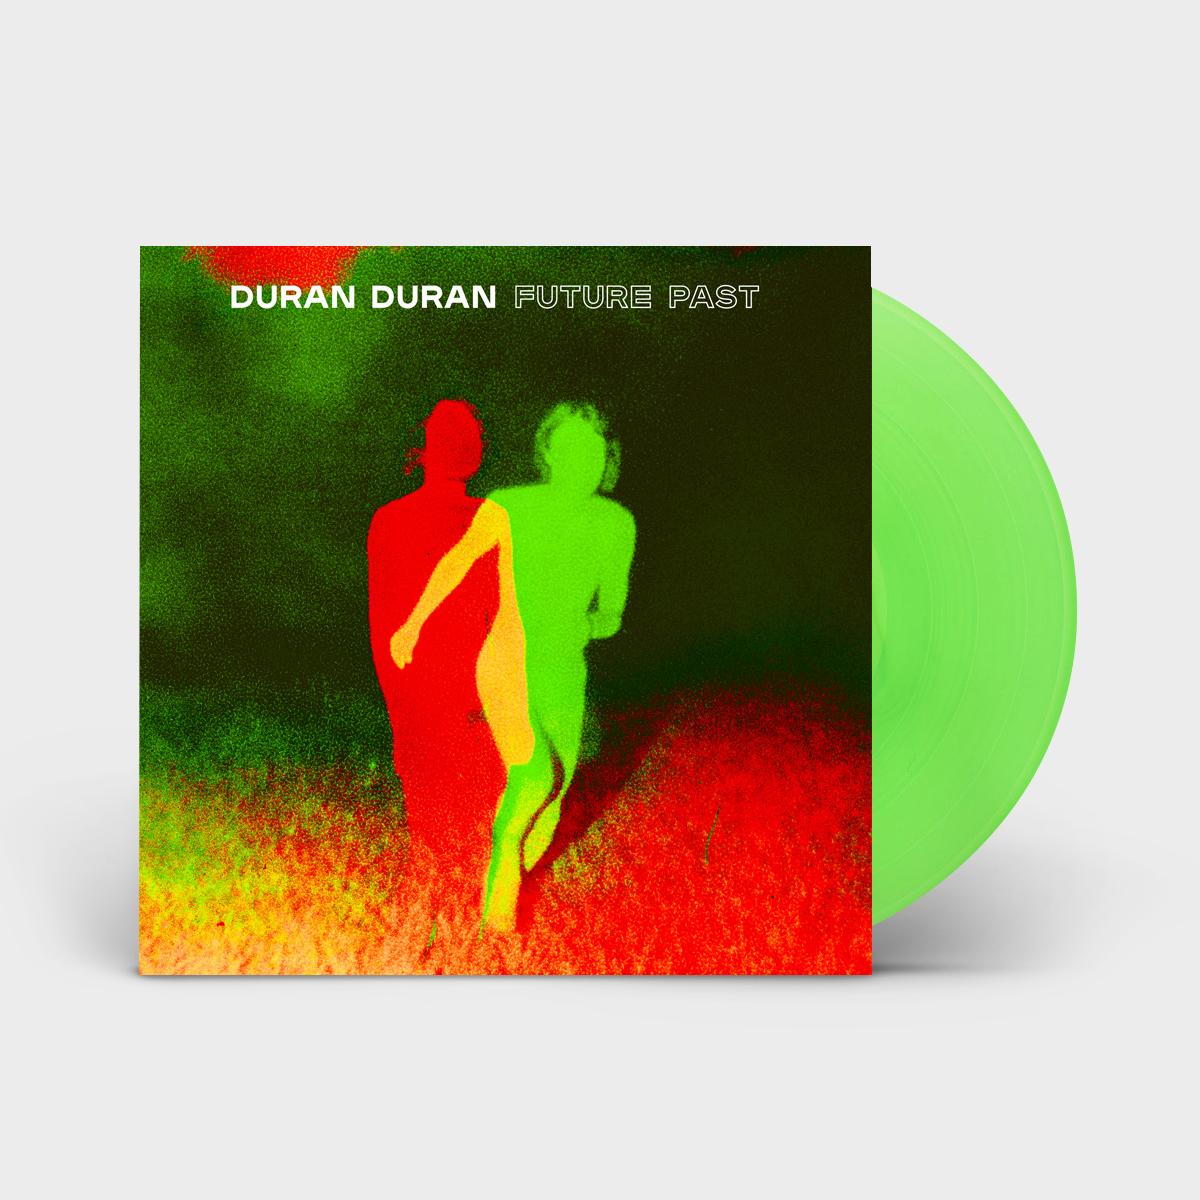 Exclusive Colored FUTURE PAST Vinyl